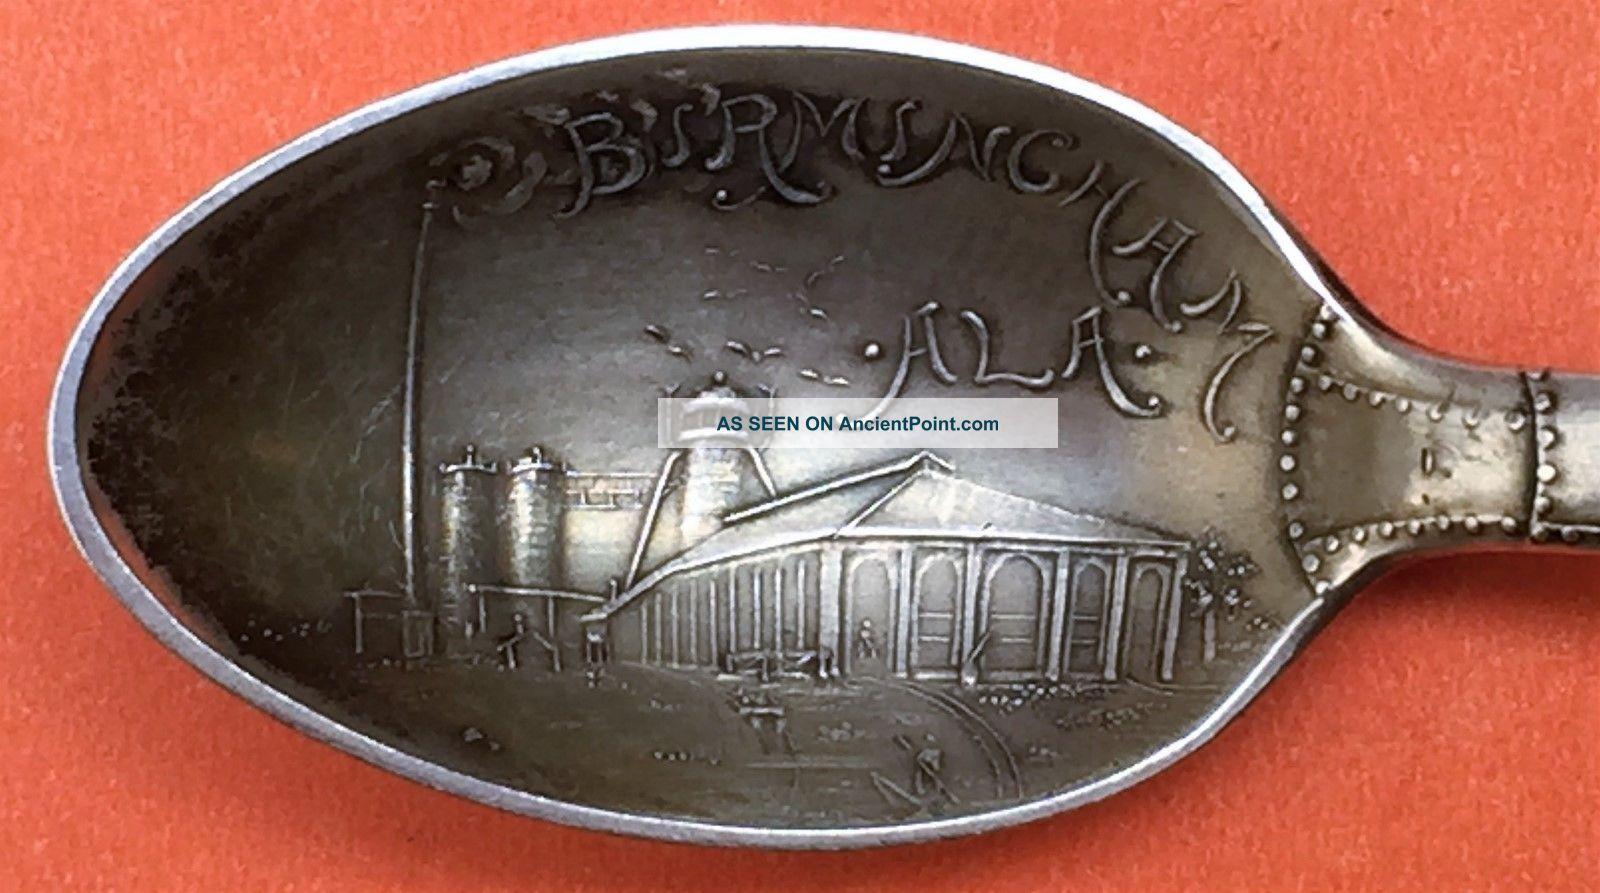 Rare Figural Smokestack Birmingham Alabama Sterling Silver Souvenir Spoon Souvenir Spoons photo